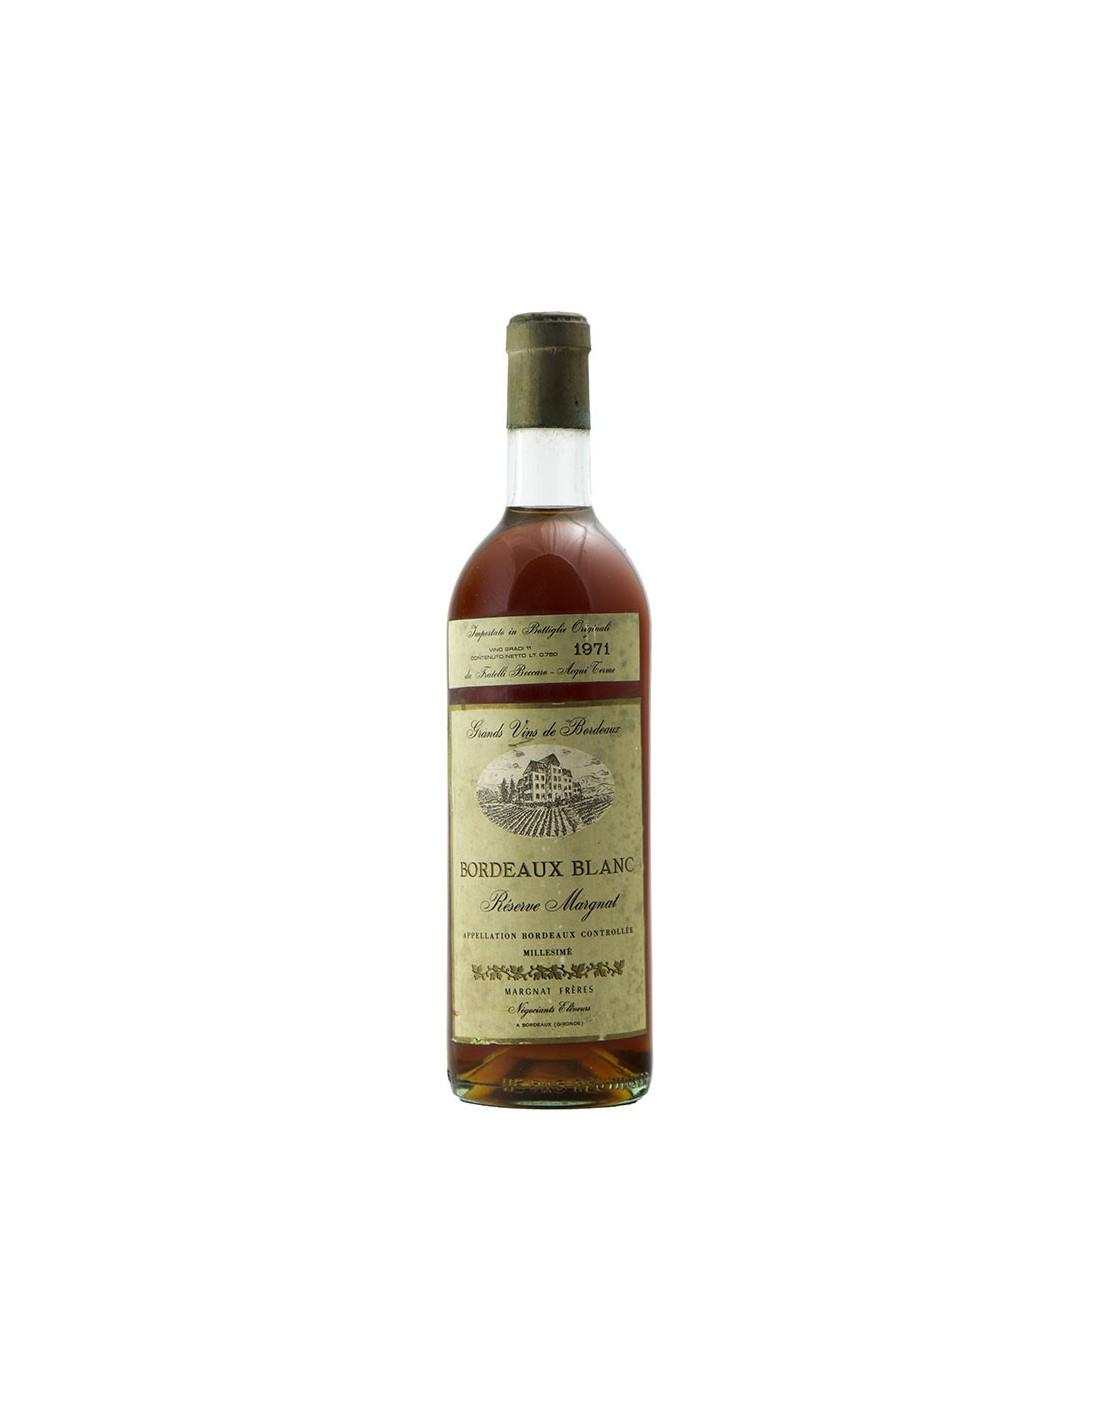 Bordeaux Blanc 1971 MARGNAT FRERES GRANDI BOTTIGLIE